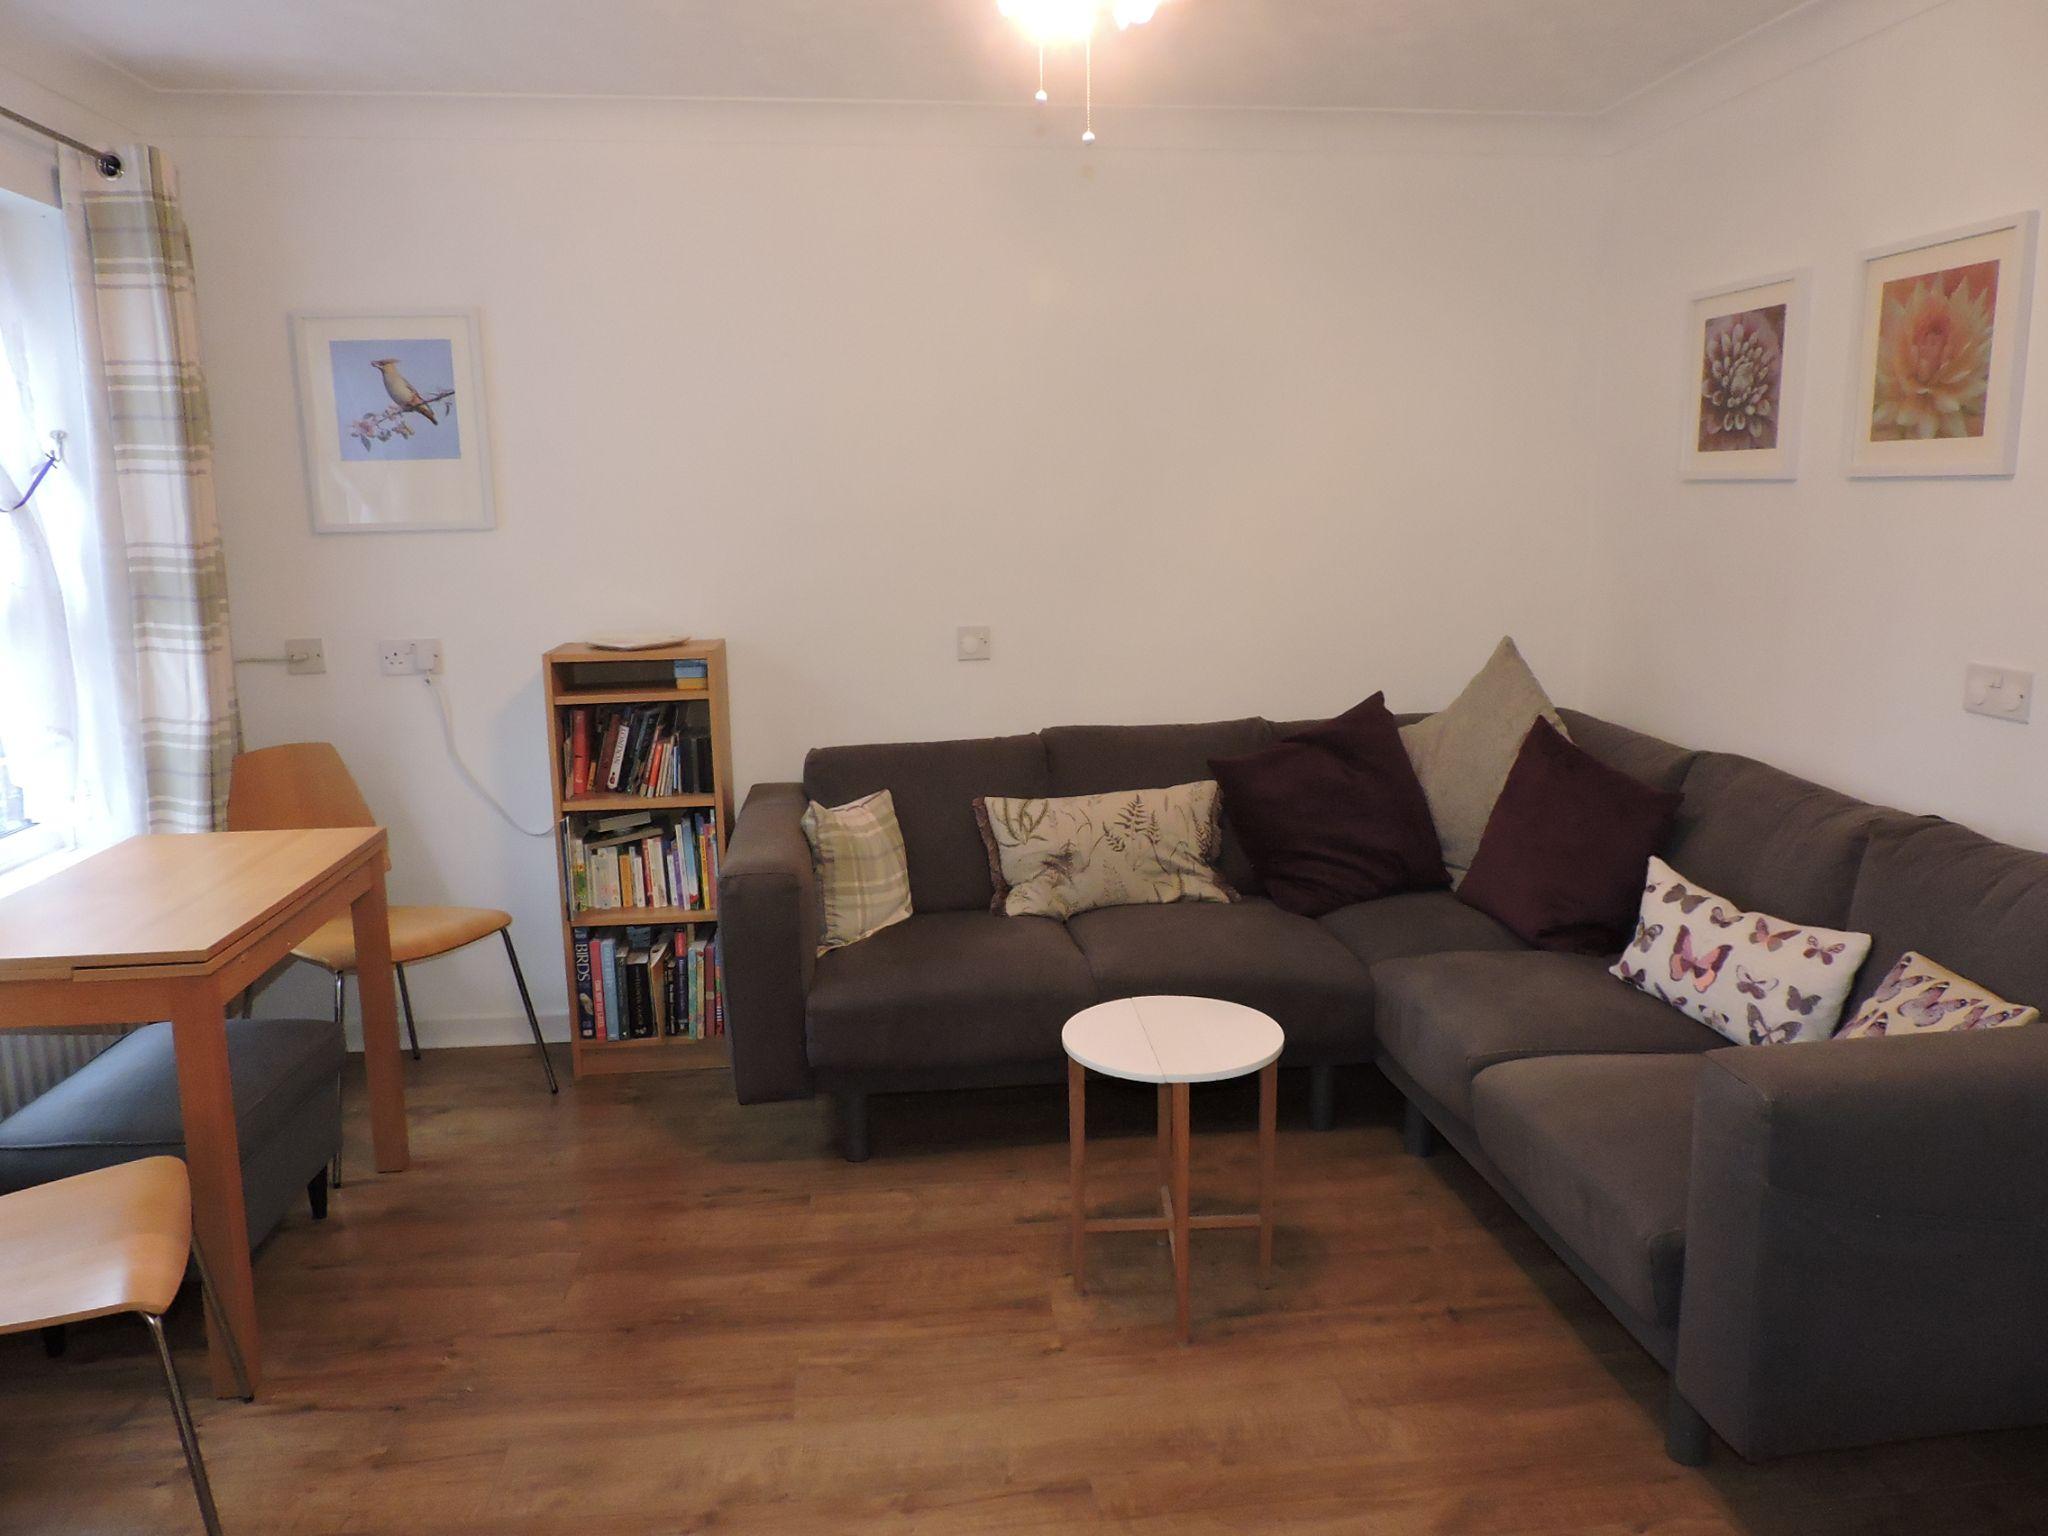 1 bedroom ground floor maisonette flat/apartment Sale Agreed in New Malden - Photograph 3